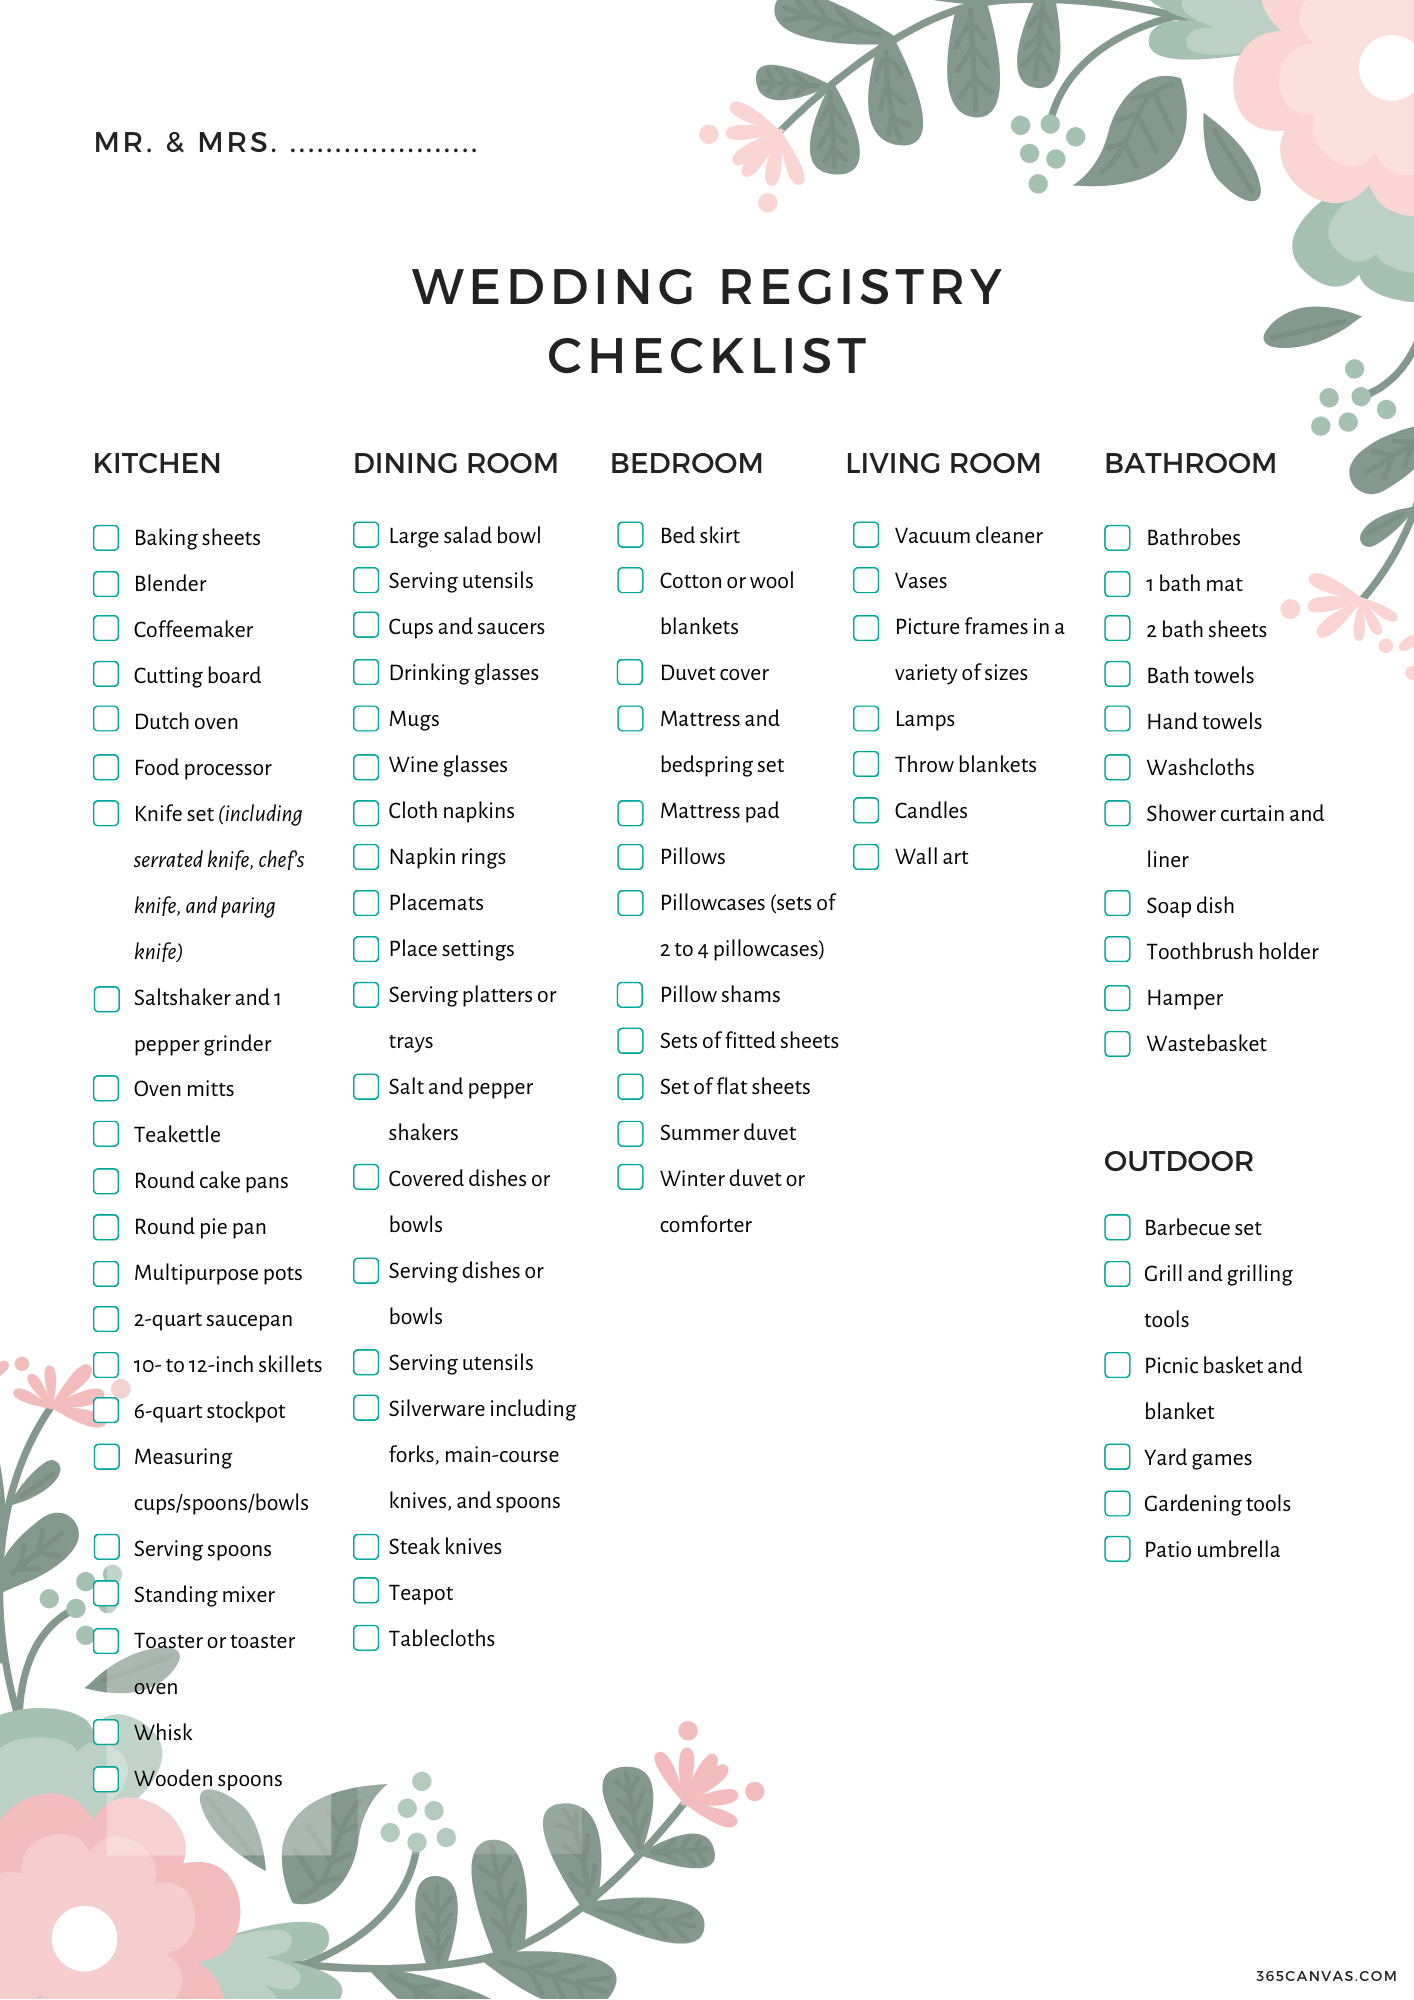 The Complete Wedding Registry Checklist (Free Printable